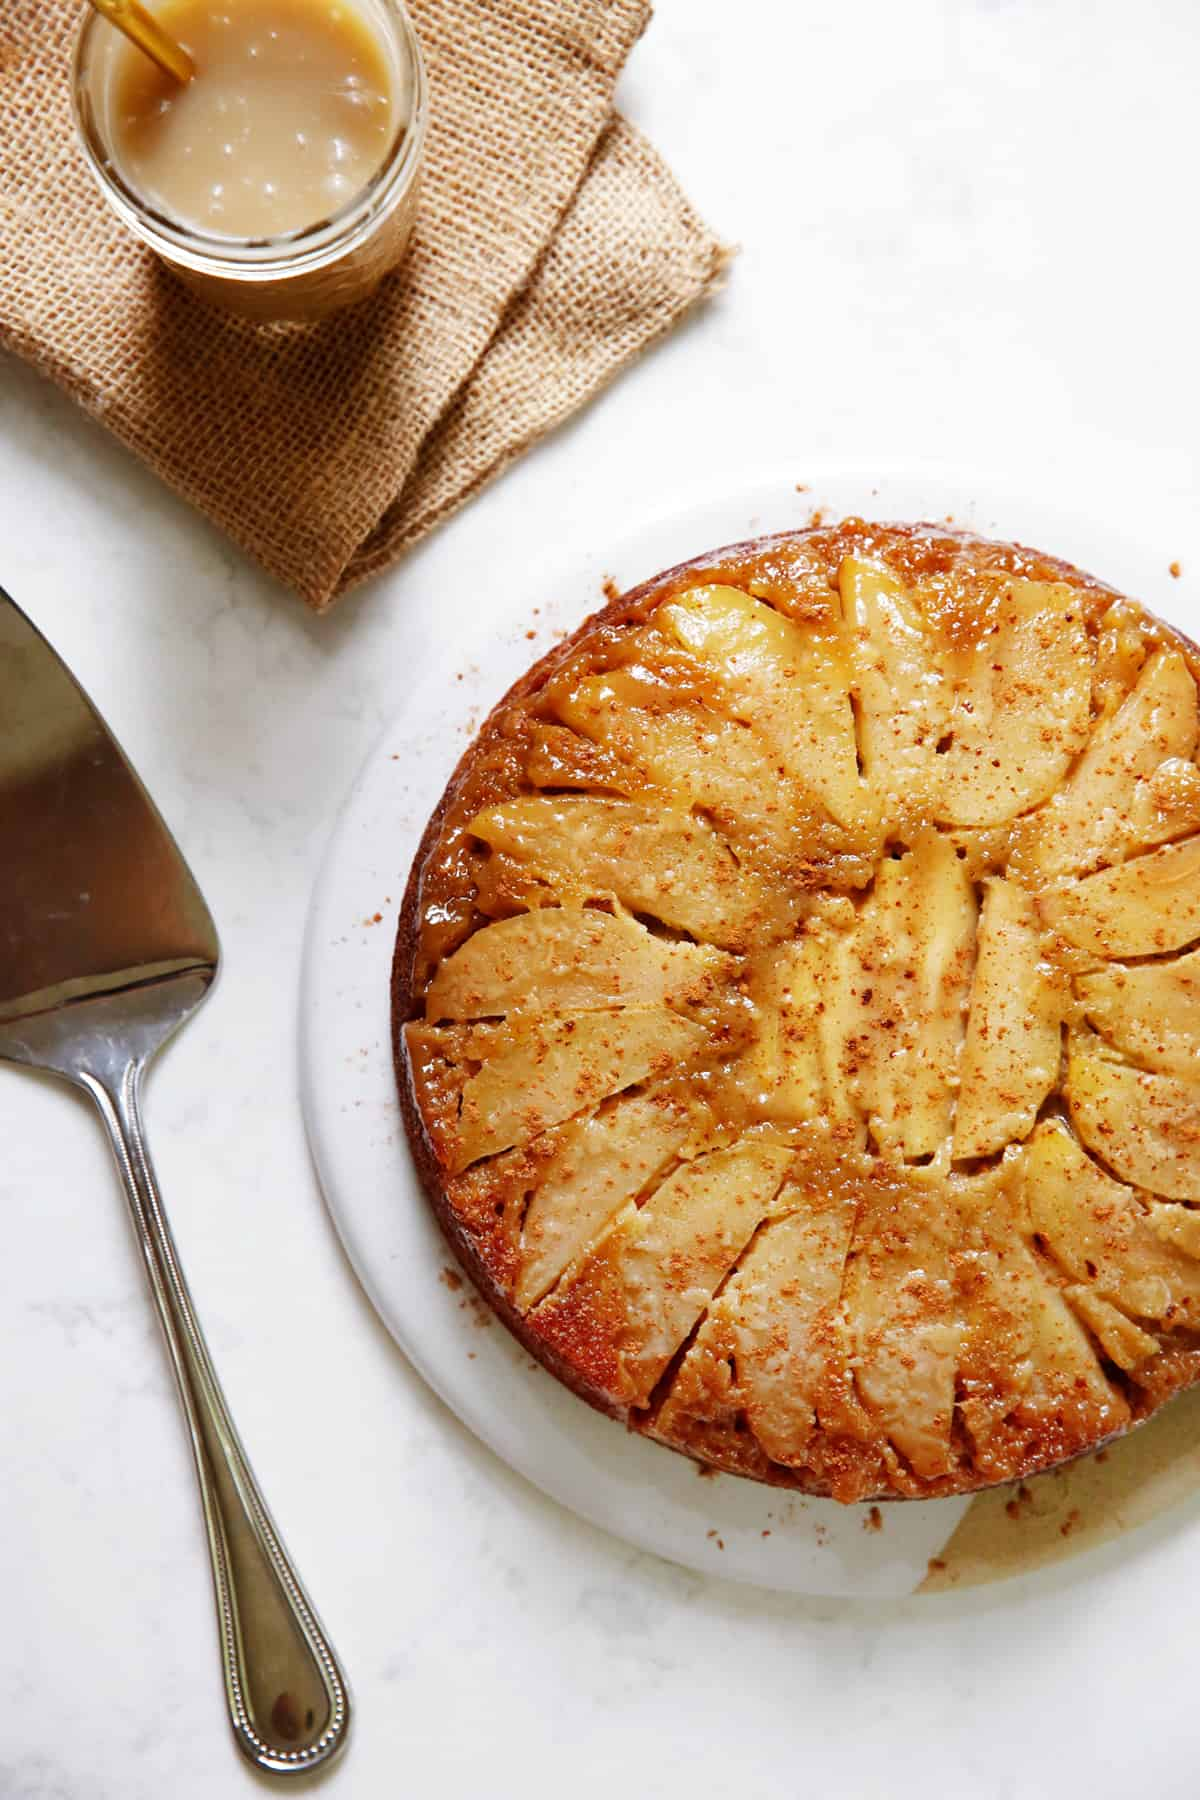 upside down apple honey cake with caramel on a platter